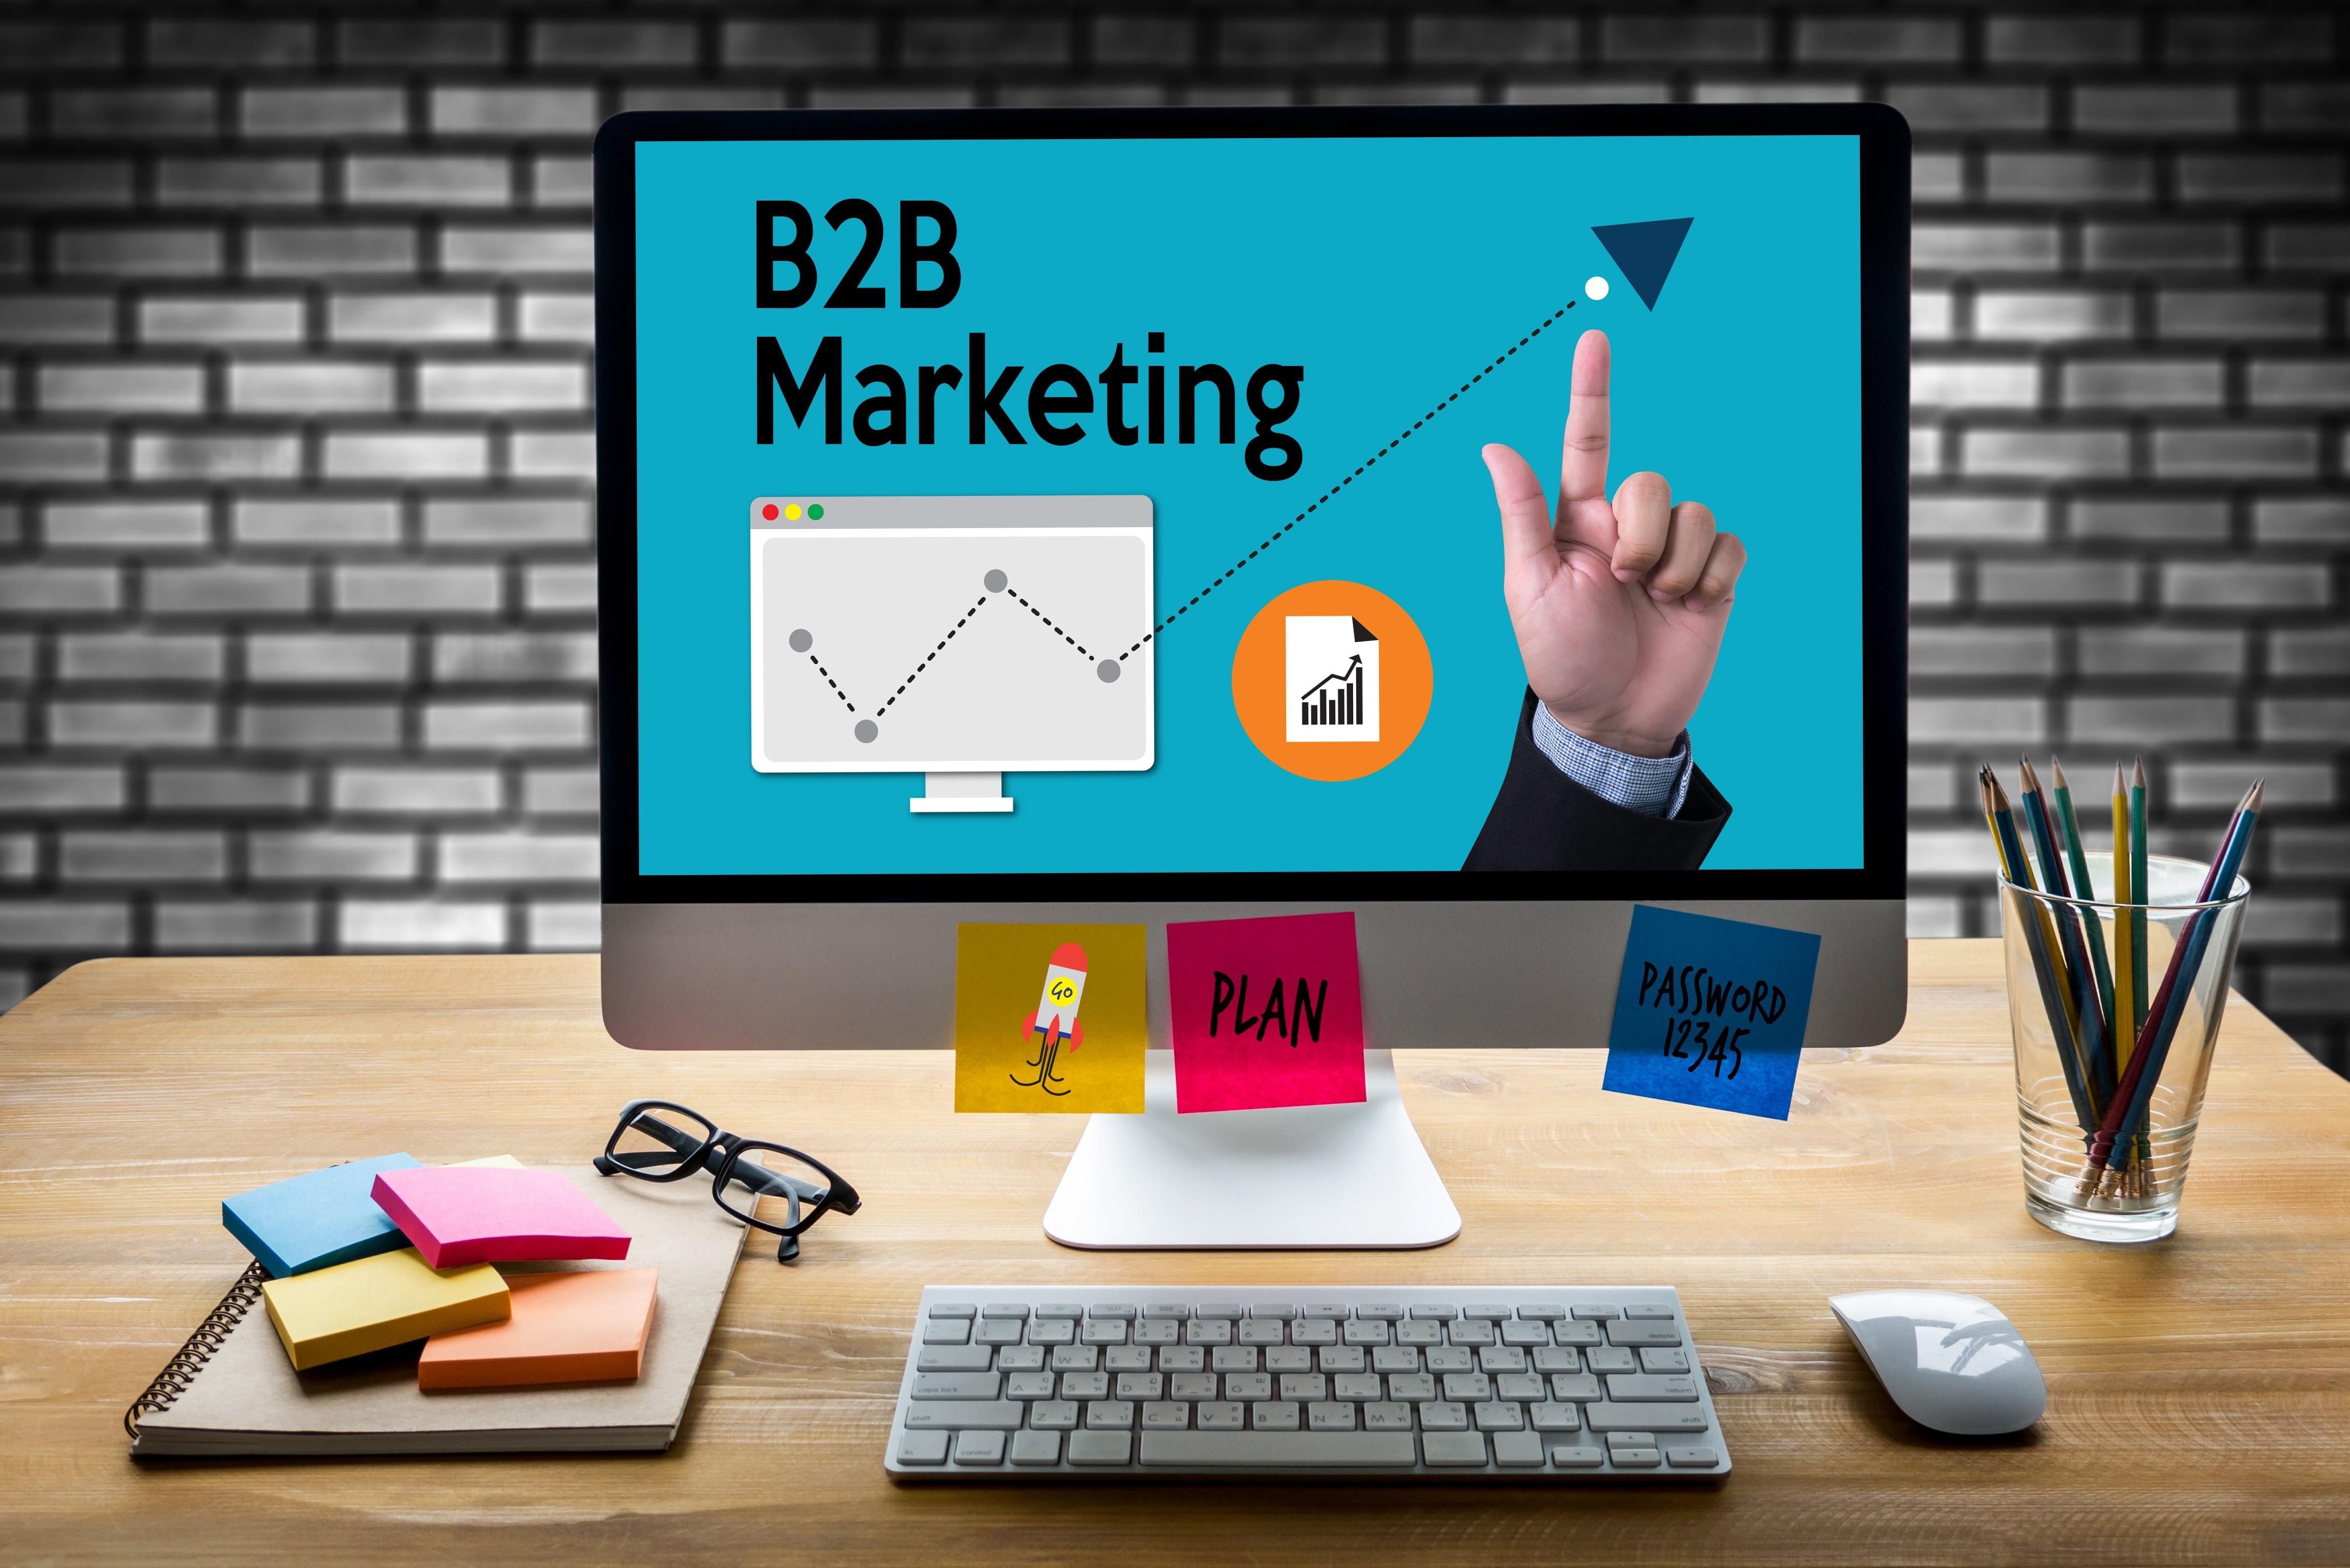 Keepital - ASIA B2B Business Tools and Marketing platform | LinkedIn